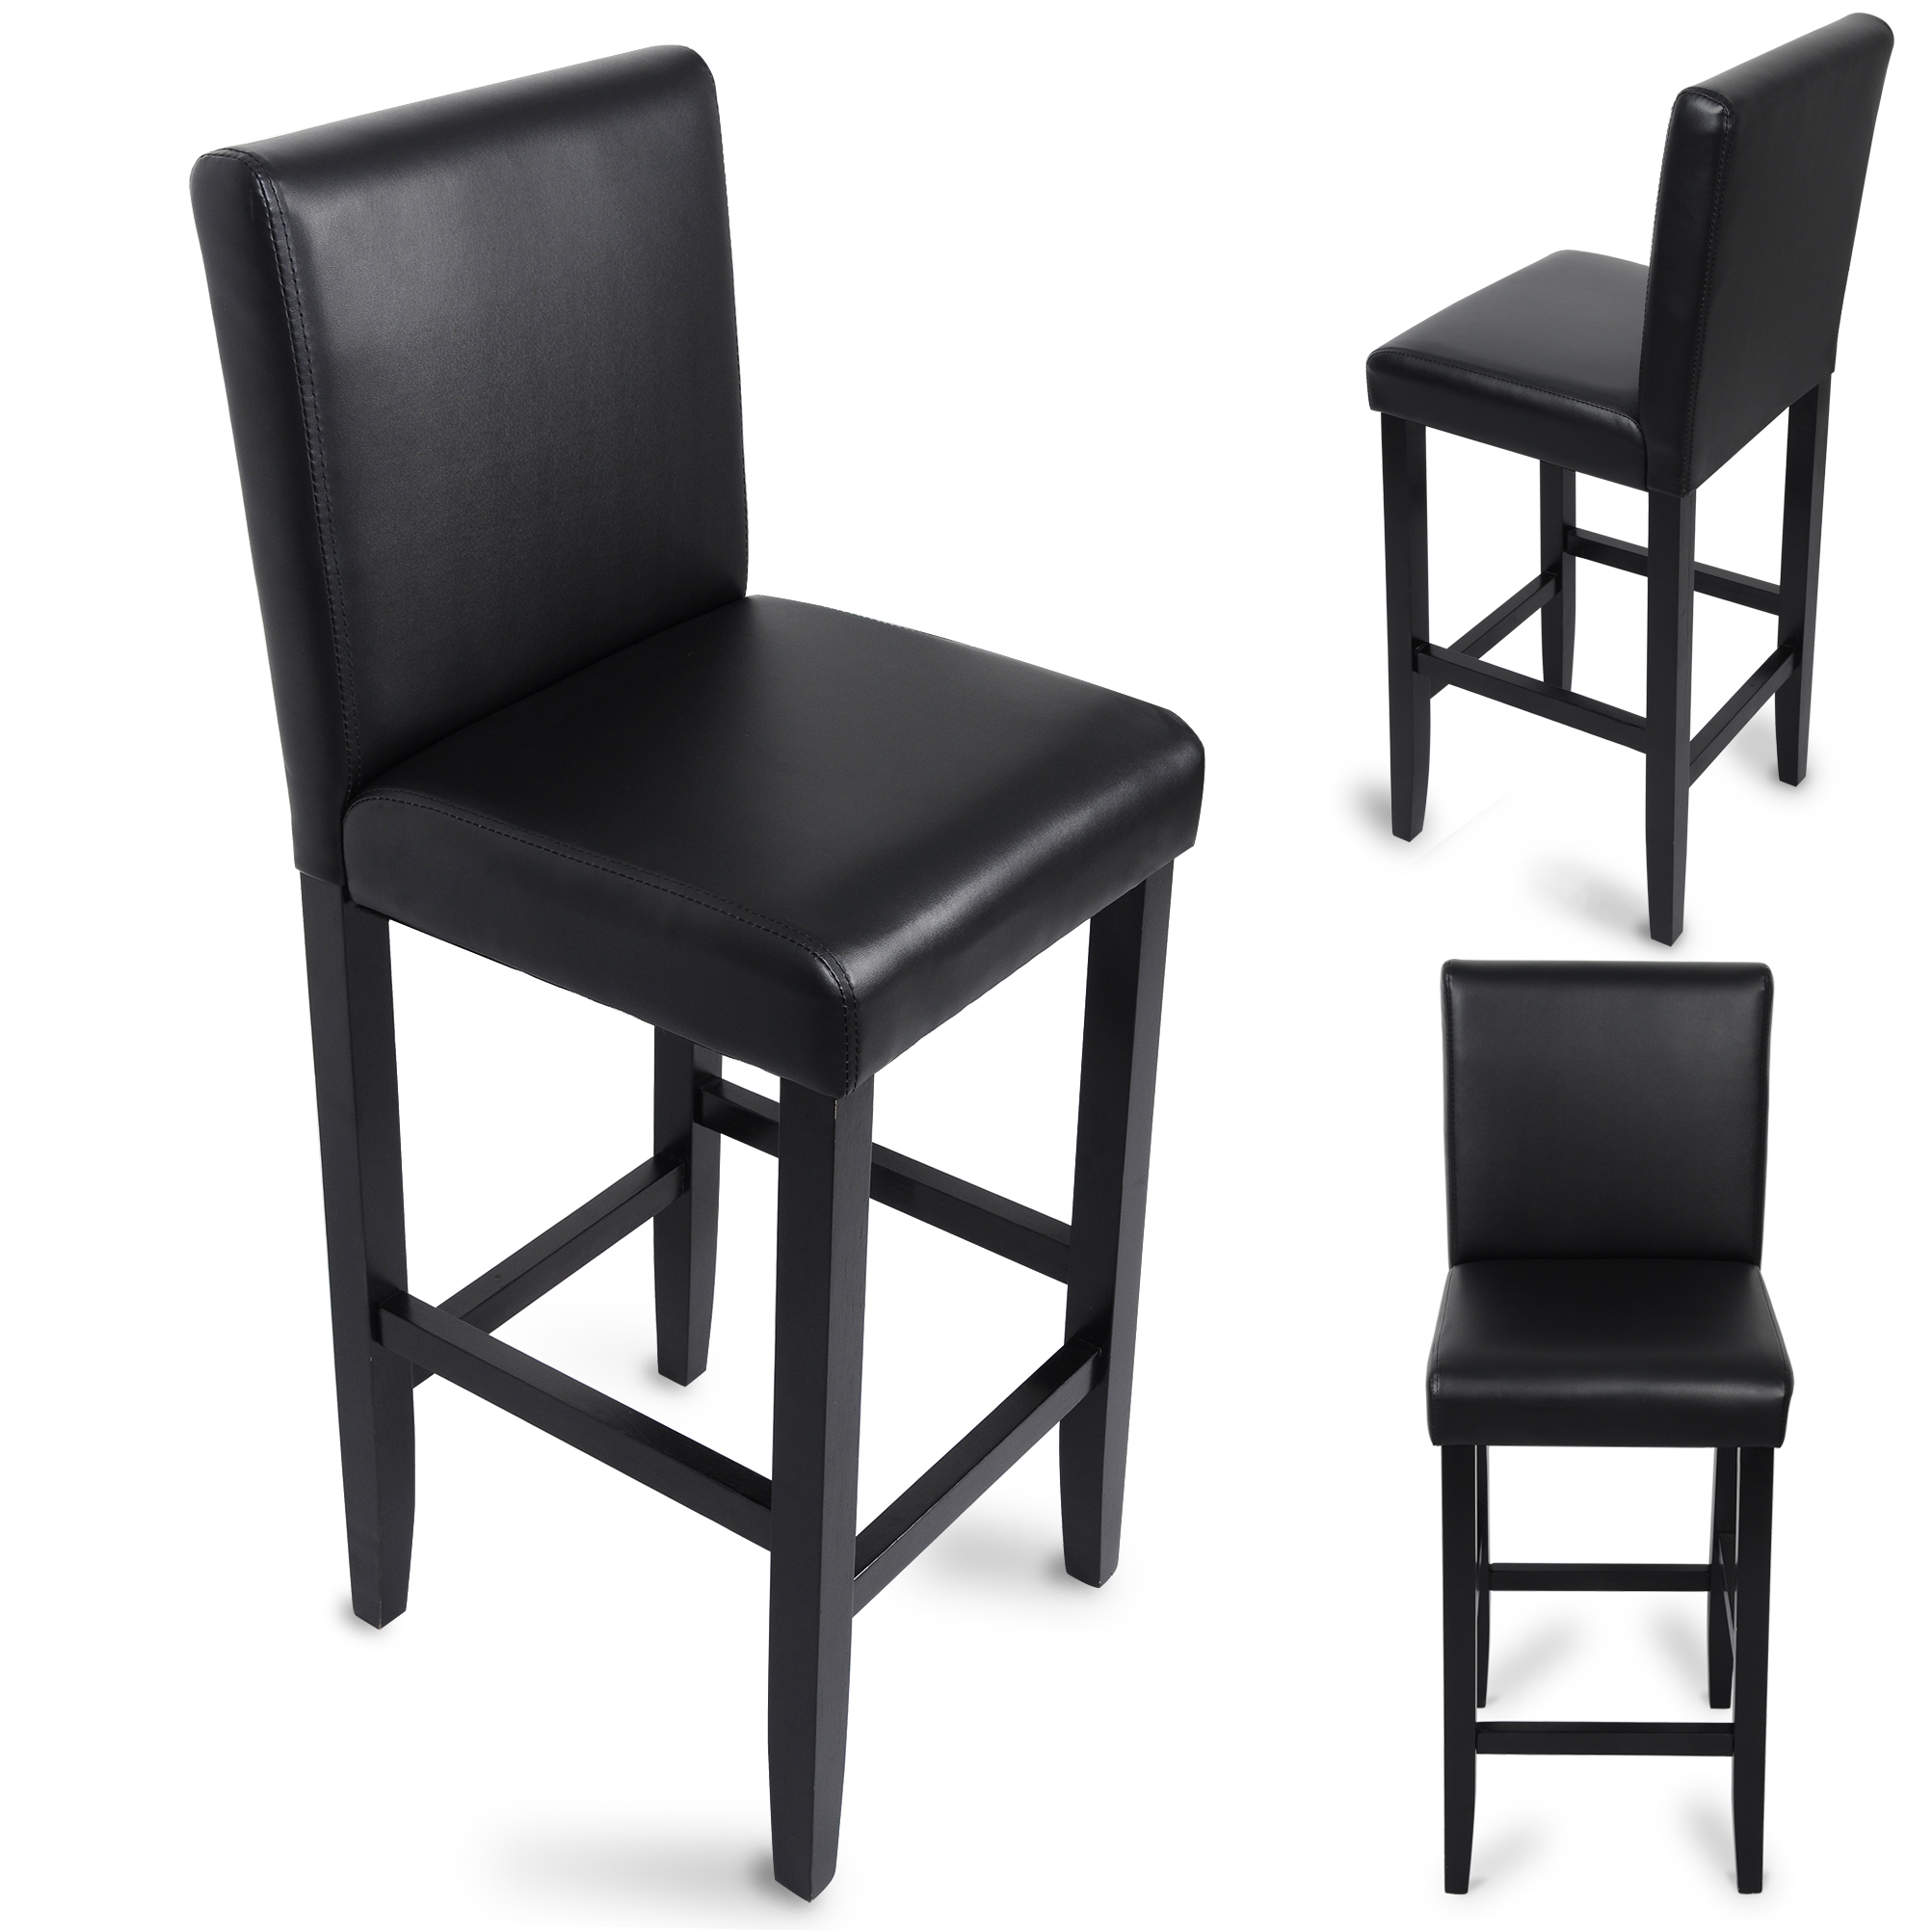 barhocker tresenhocker bistrohocker mit lehne hocker. Black Bedroom Furniture Sets. Home Design Ideas